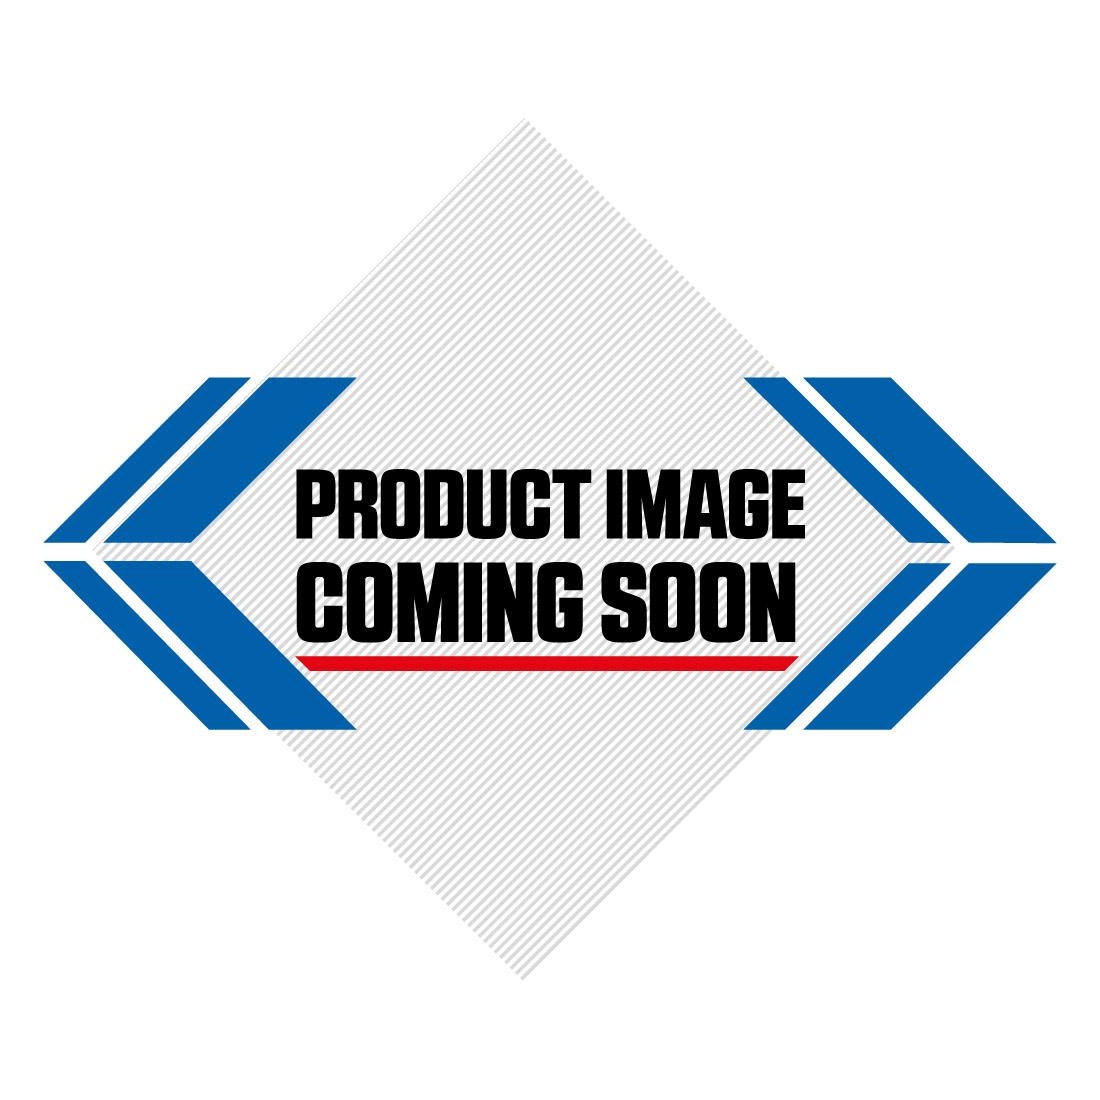 Renthal Twinring Rear Sprocket Kawasaki KX KXF KDX KLX Suzuki RMZ - Green Image-6